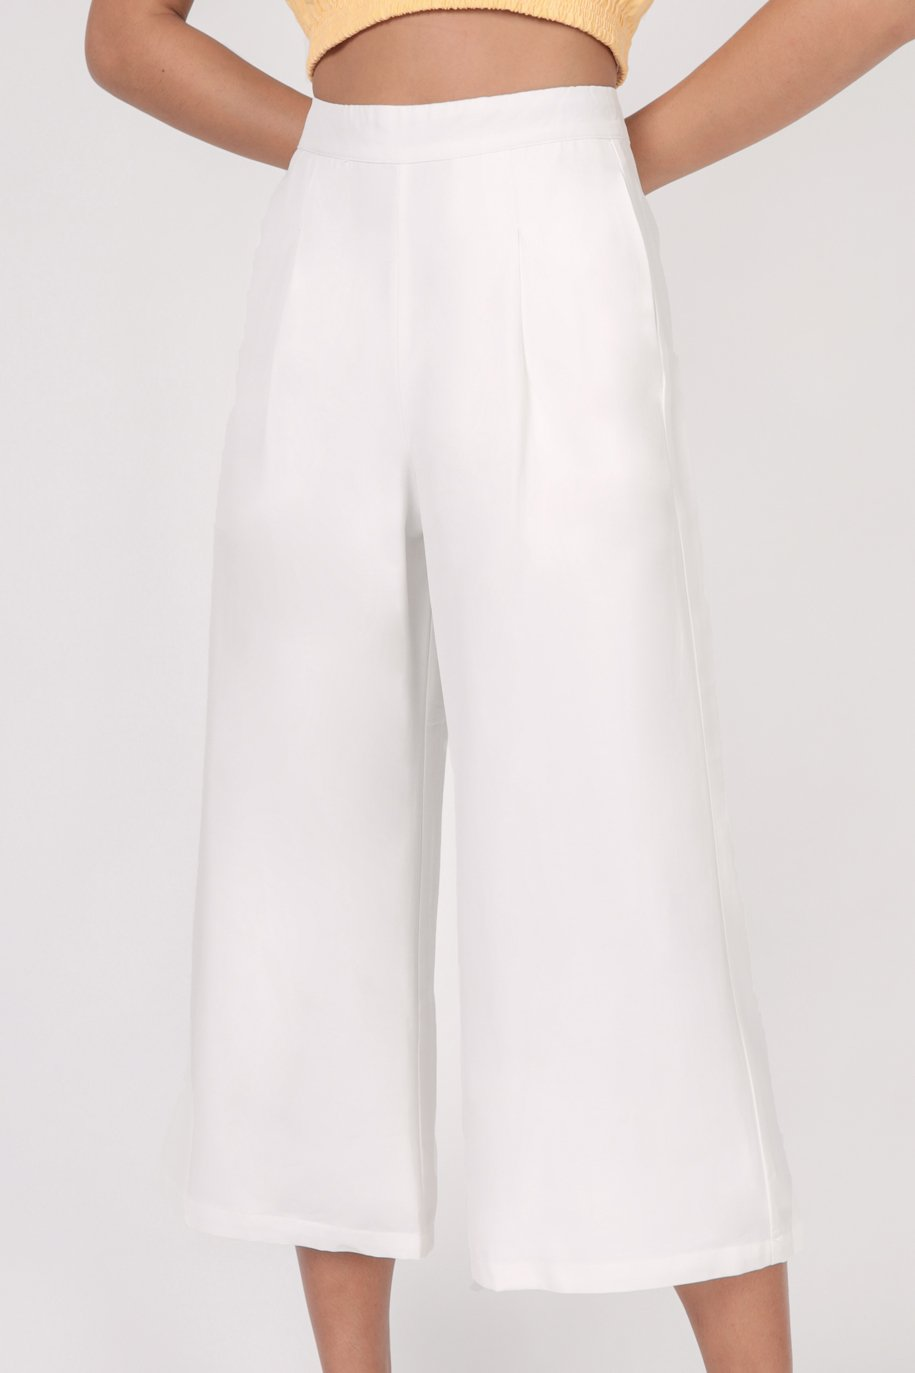 Terra Culottes (White)